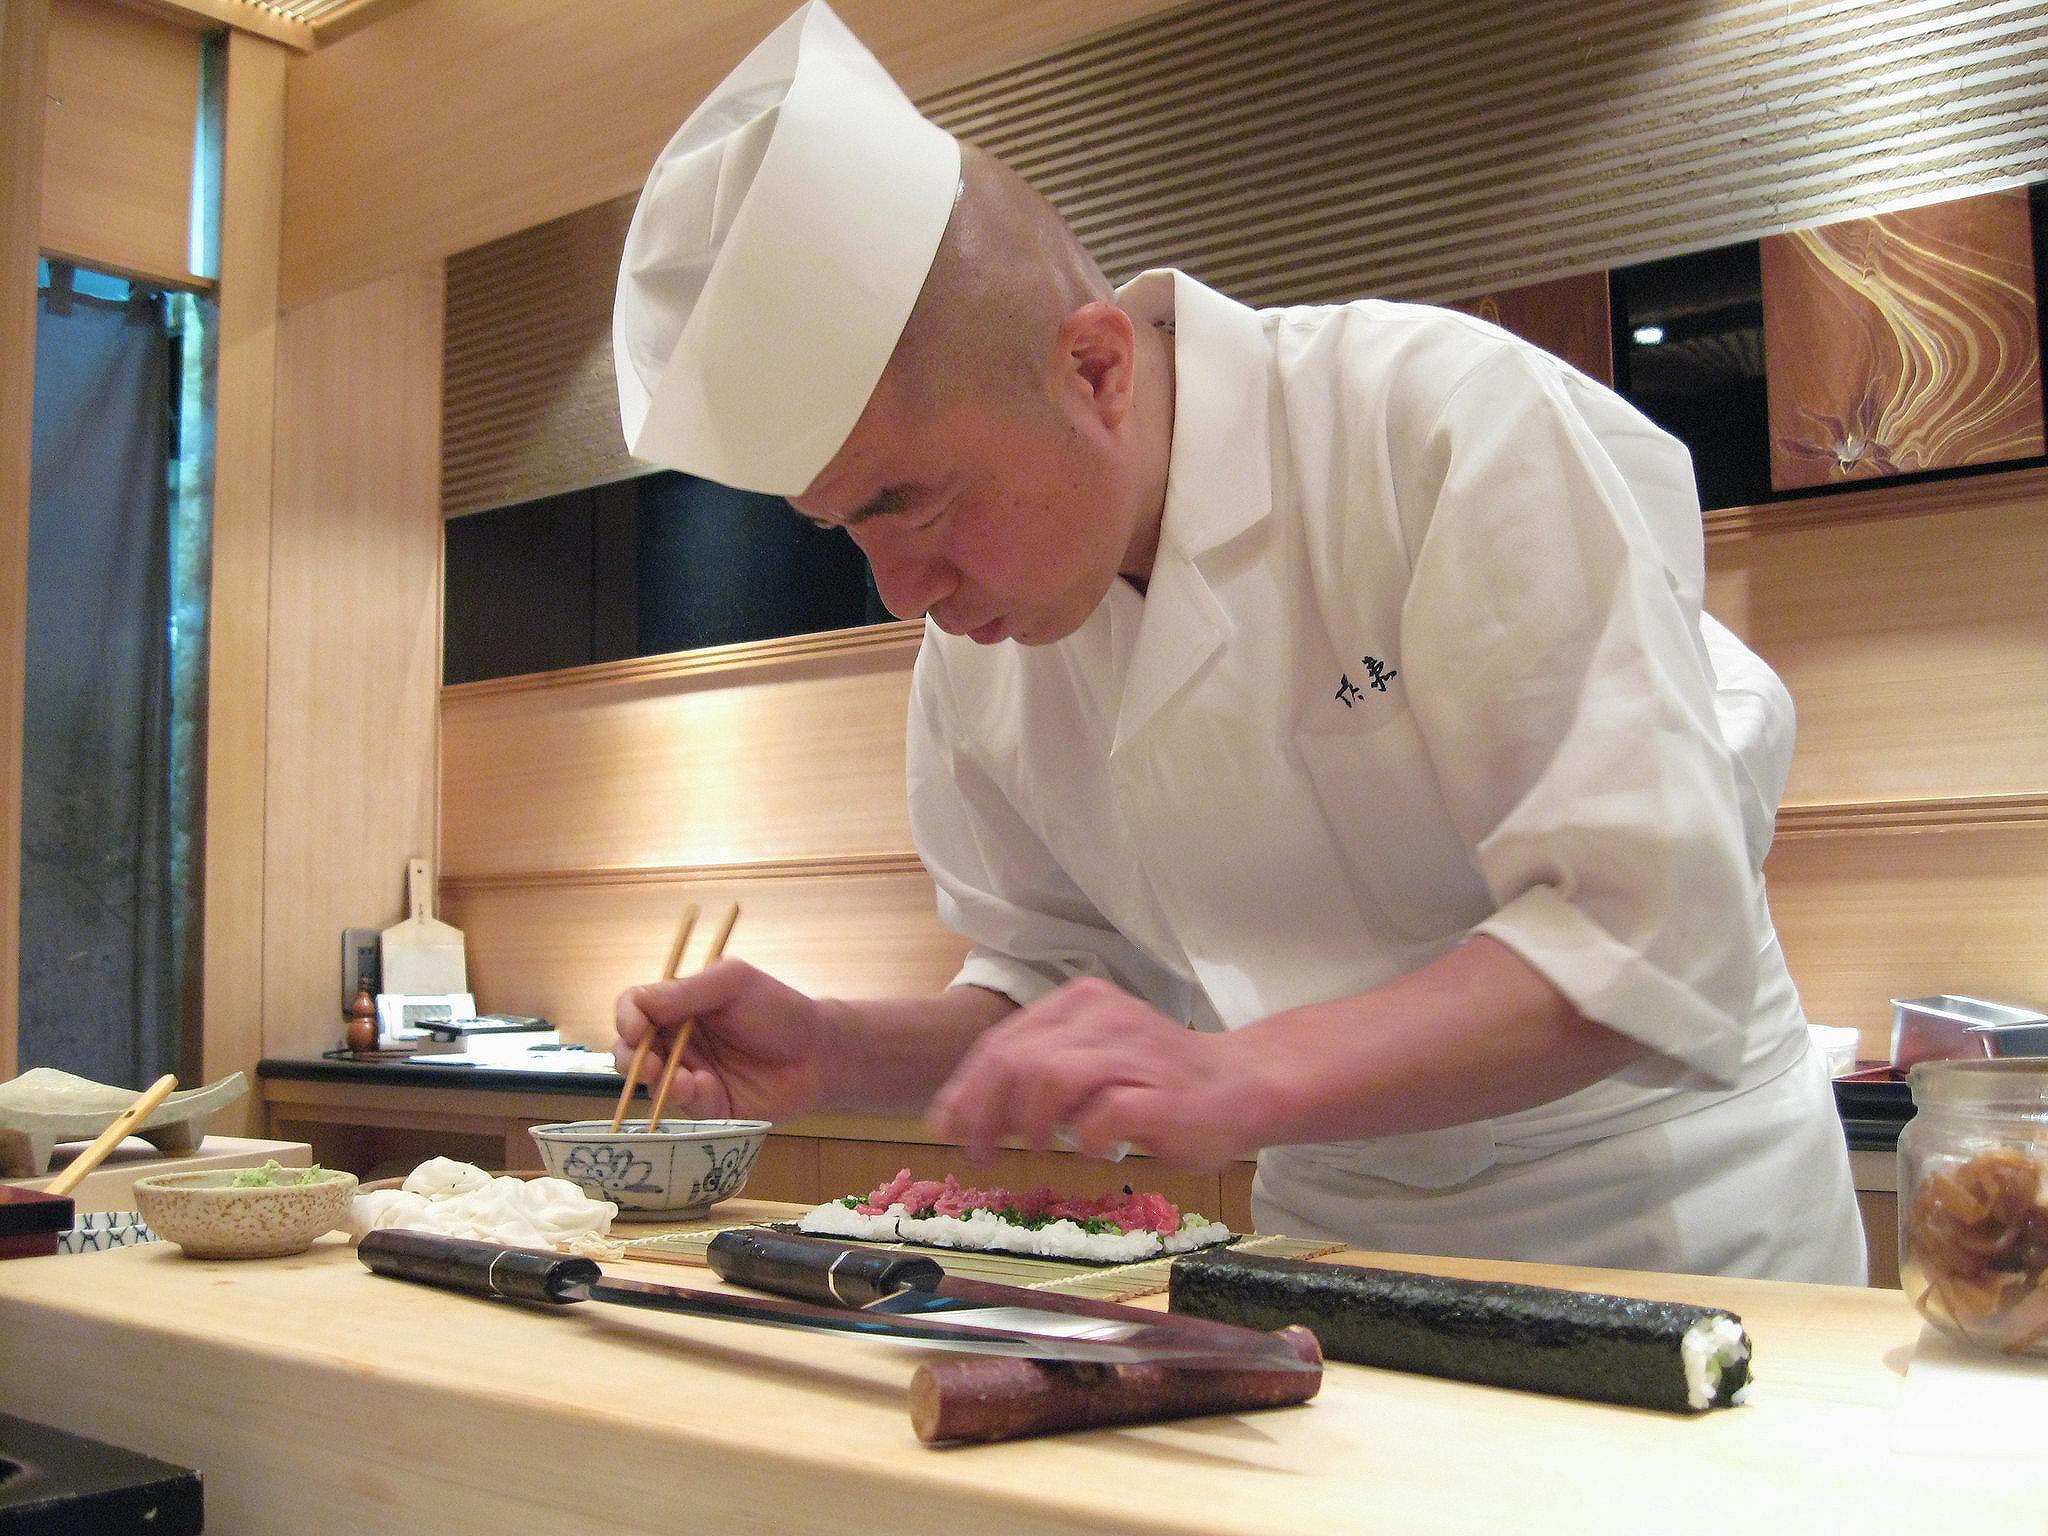 Kyubei, Ginza, Tokyo - Chef Preparing Negamaki